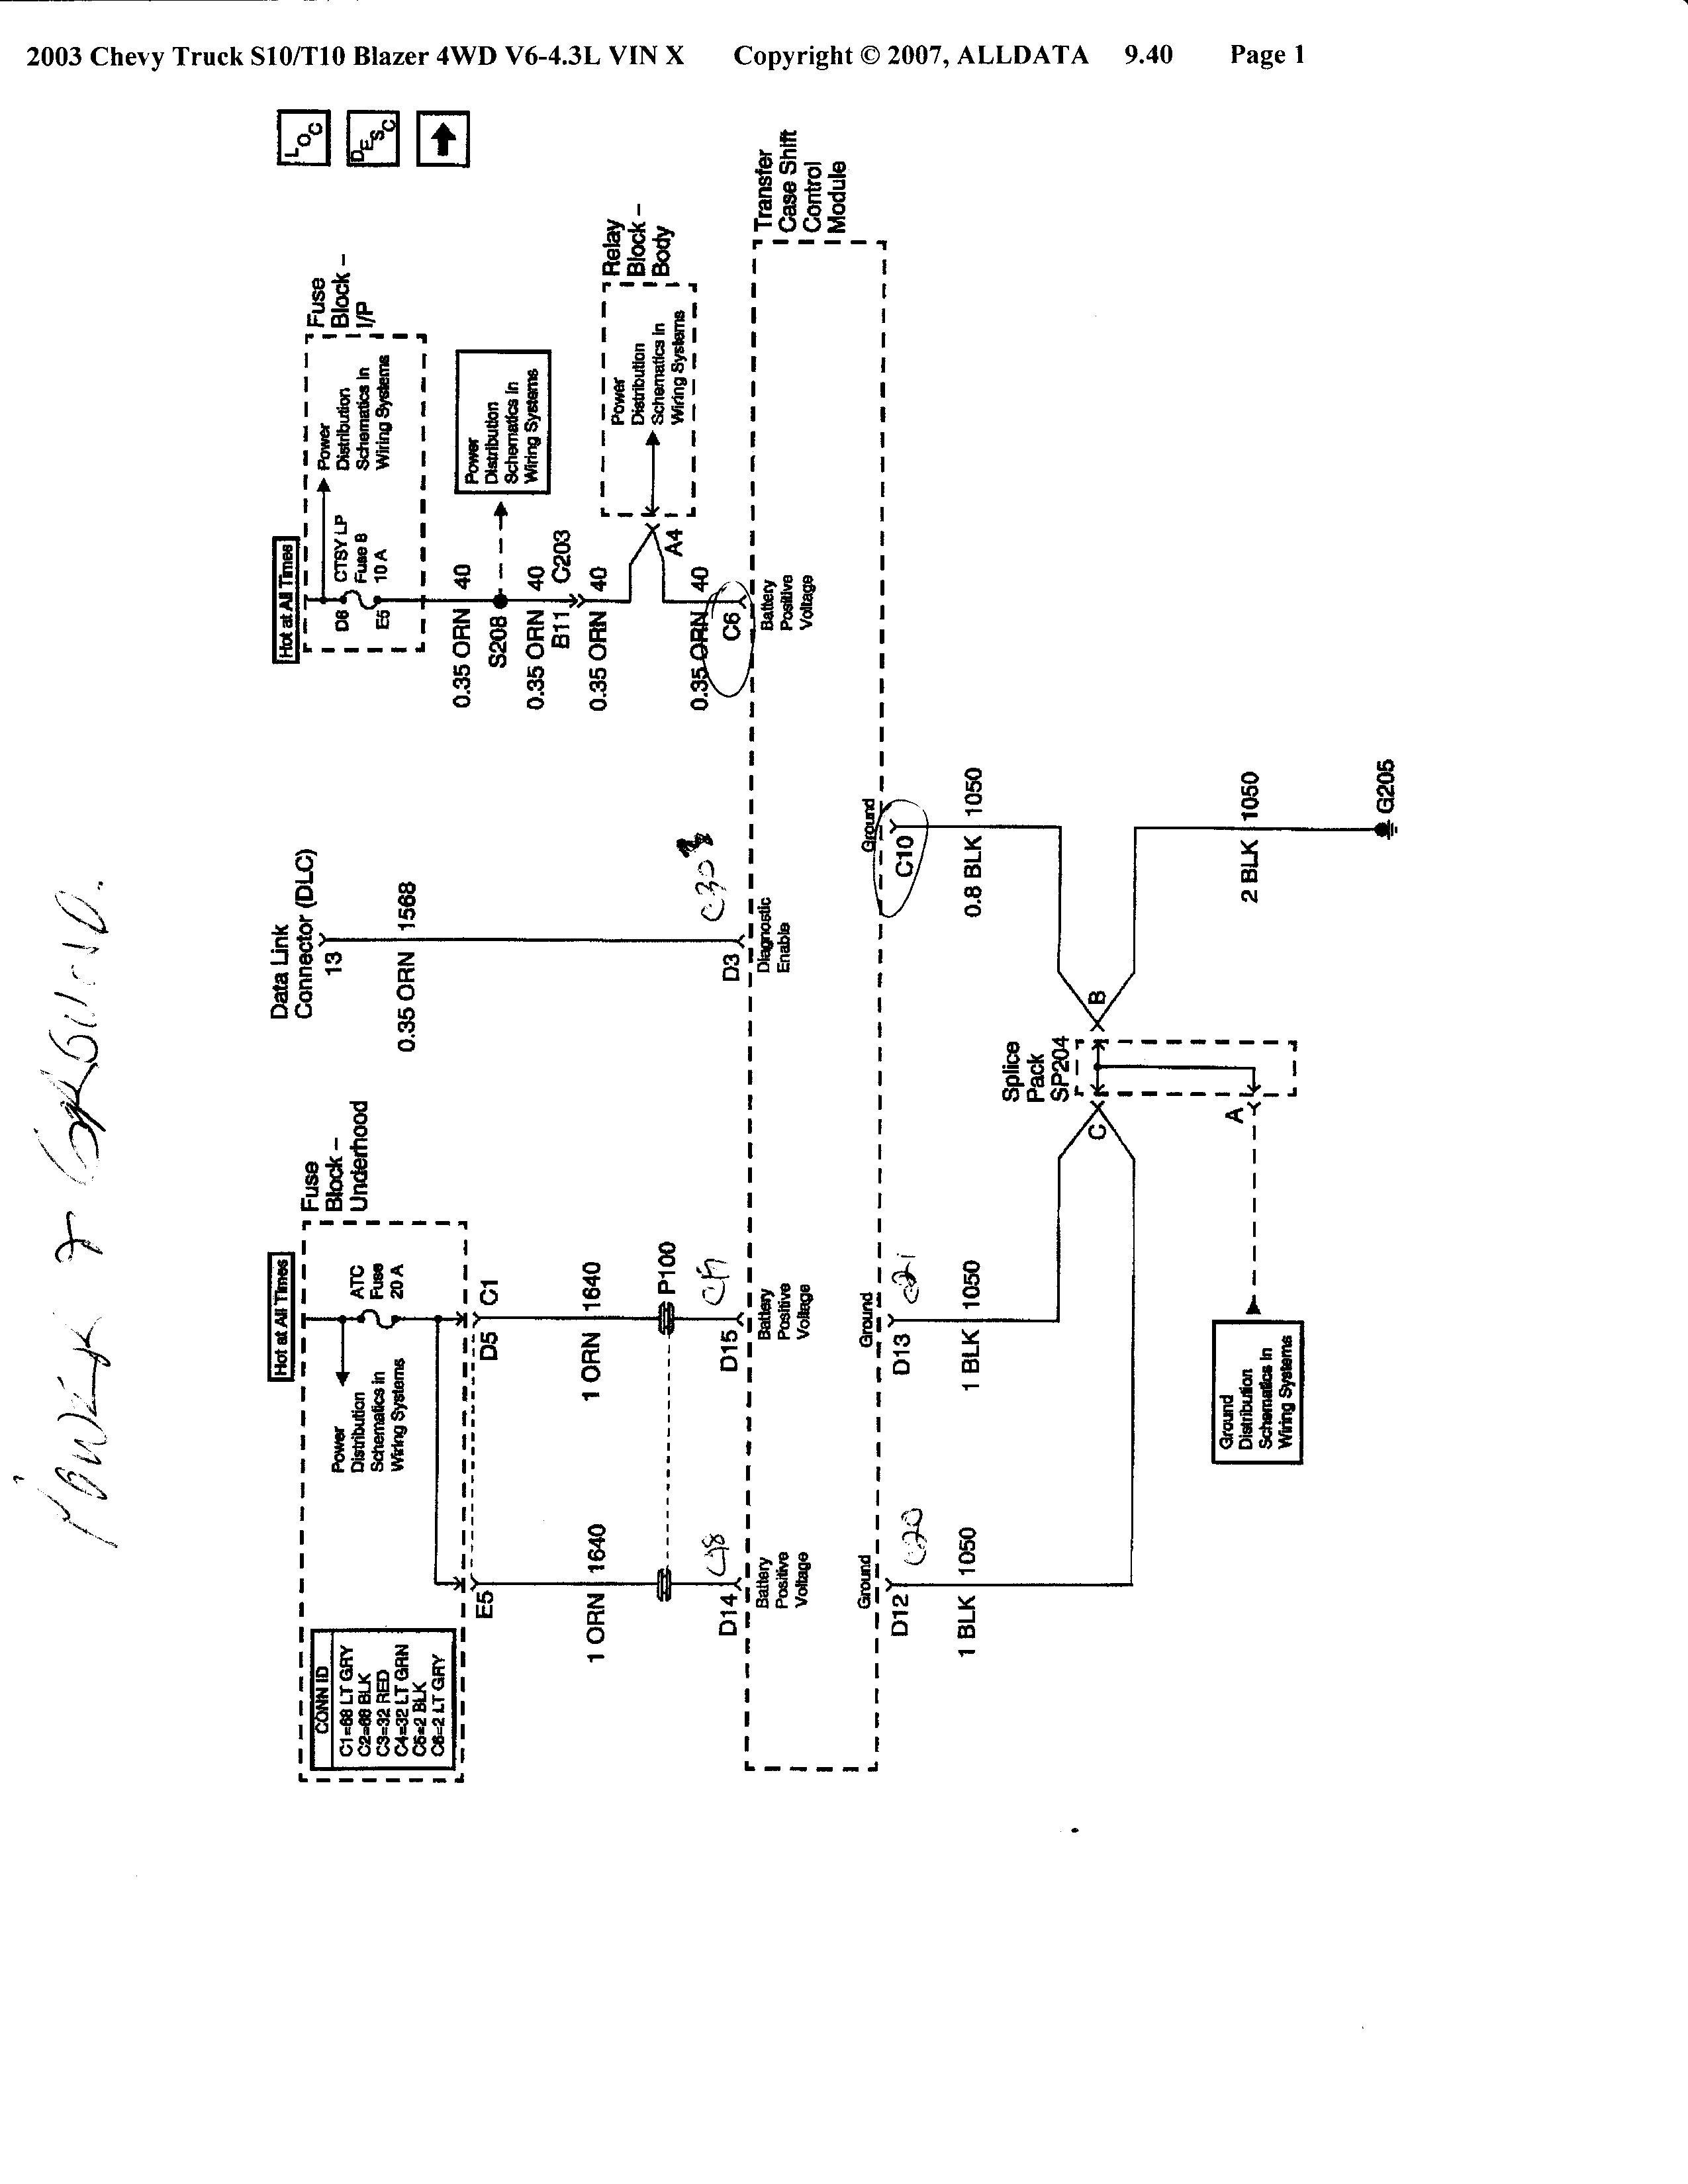 2002 Chevy S10 Transfer Case Wiring Diagram Wiring Diagram Frankmotors Es